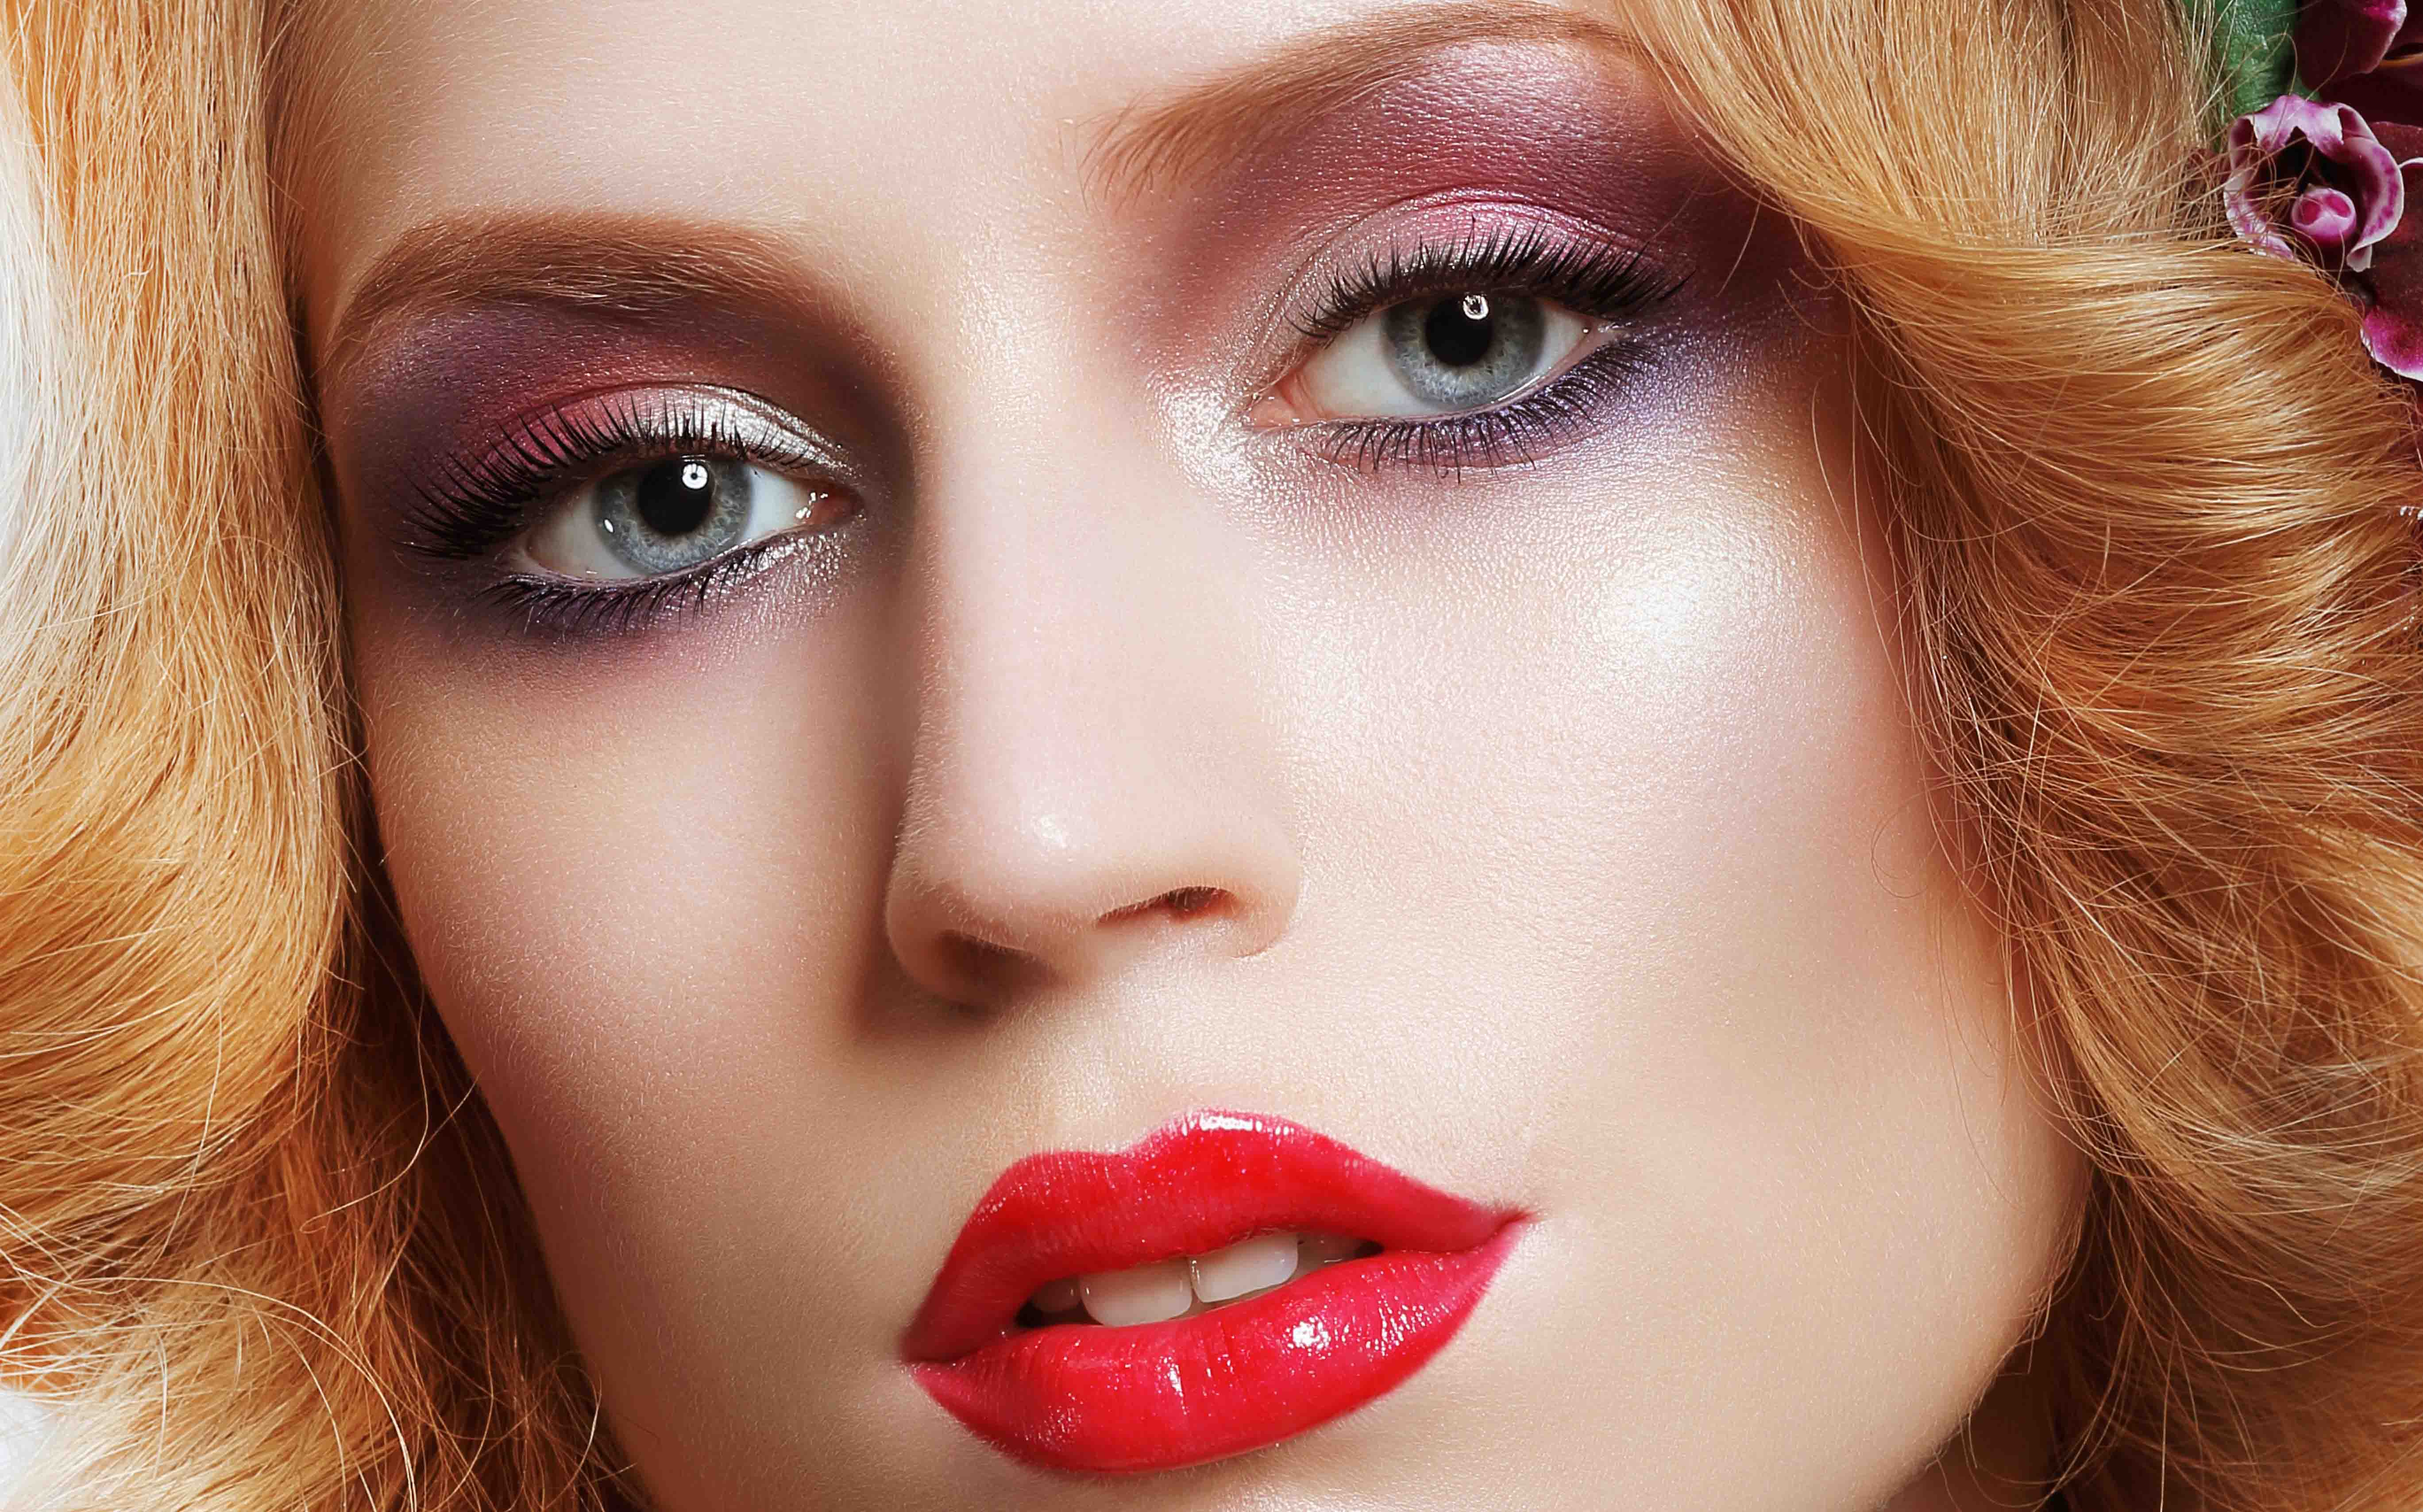 make-up-primavera-zephir-parrucchieri-ascona-muralto